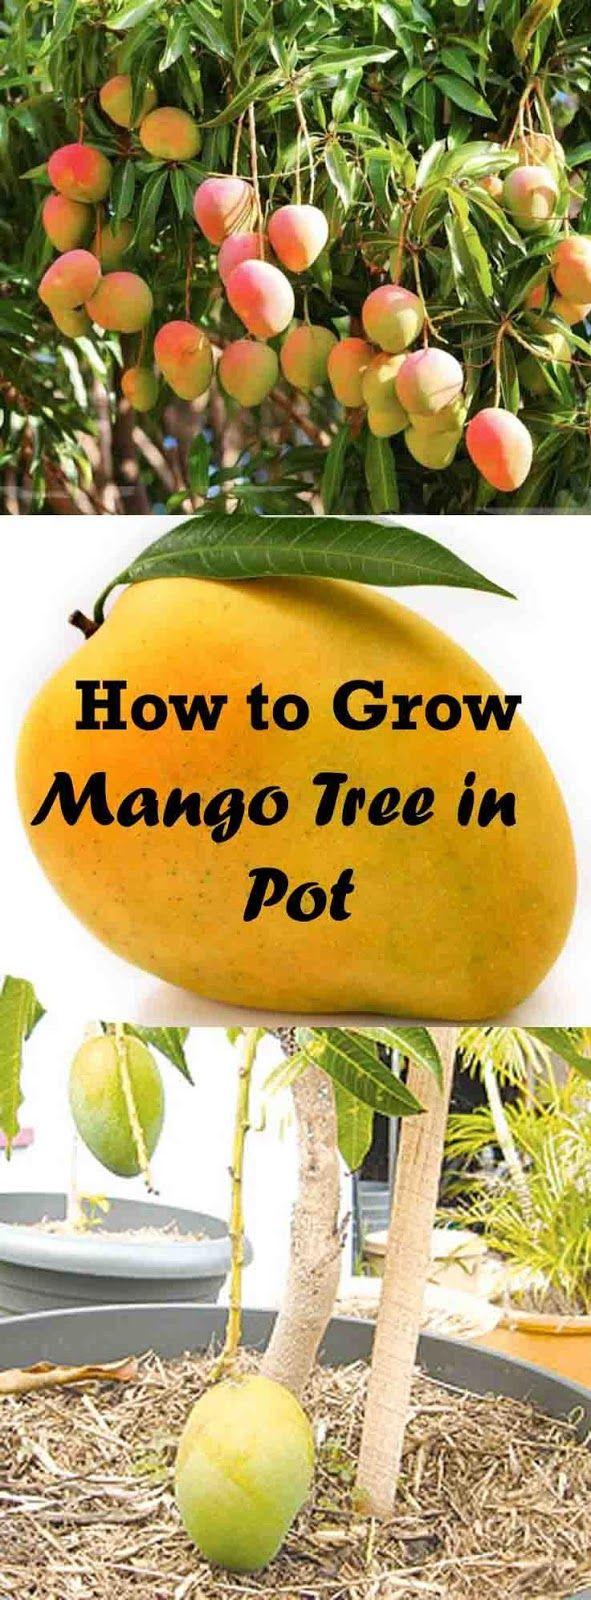 Flowers Gardens: How to Grow Mango Tree in Pot